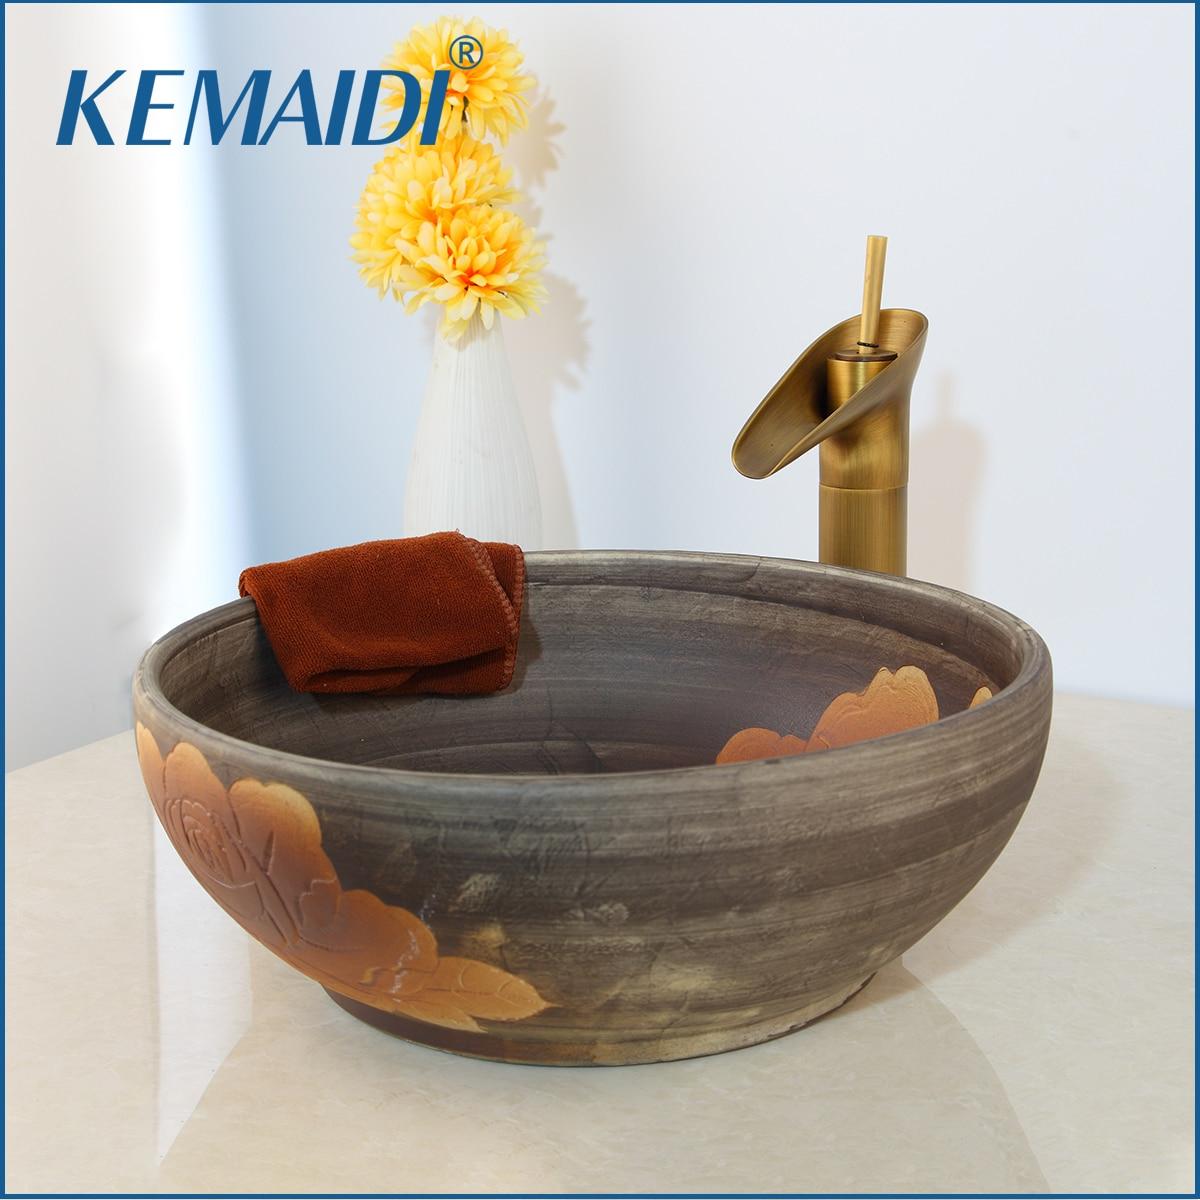 KEMAIDI Art Ceramic Vessel Bathroom Sink Set Waterfall Antique Brass Bathroom Faucet White Design Golden inside Basin Mixer Tap-in Bathroom Sinks from Home Improvement    1